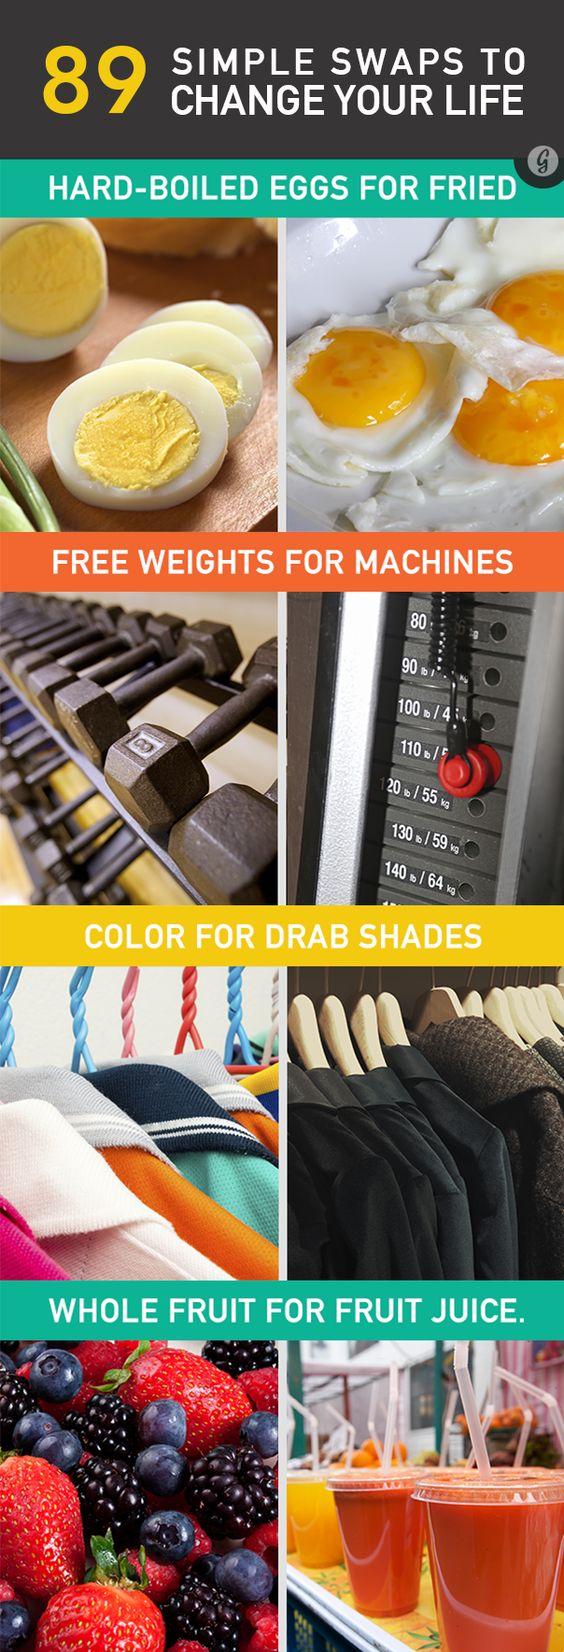 : Healthy Swaps, Health Fitness, Positive Change, Lifestyle Change, Healthy Lifestyle, Simple Swaps, Healthy Tip, Healthy Food